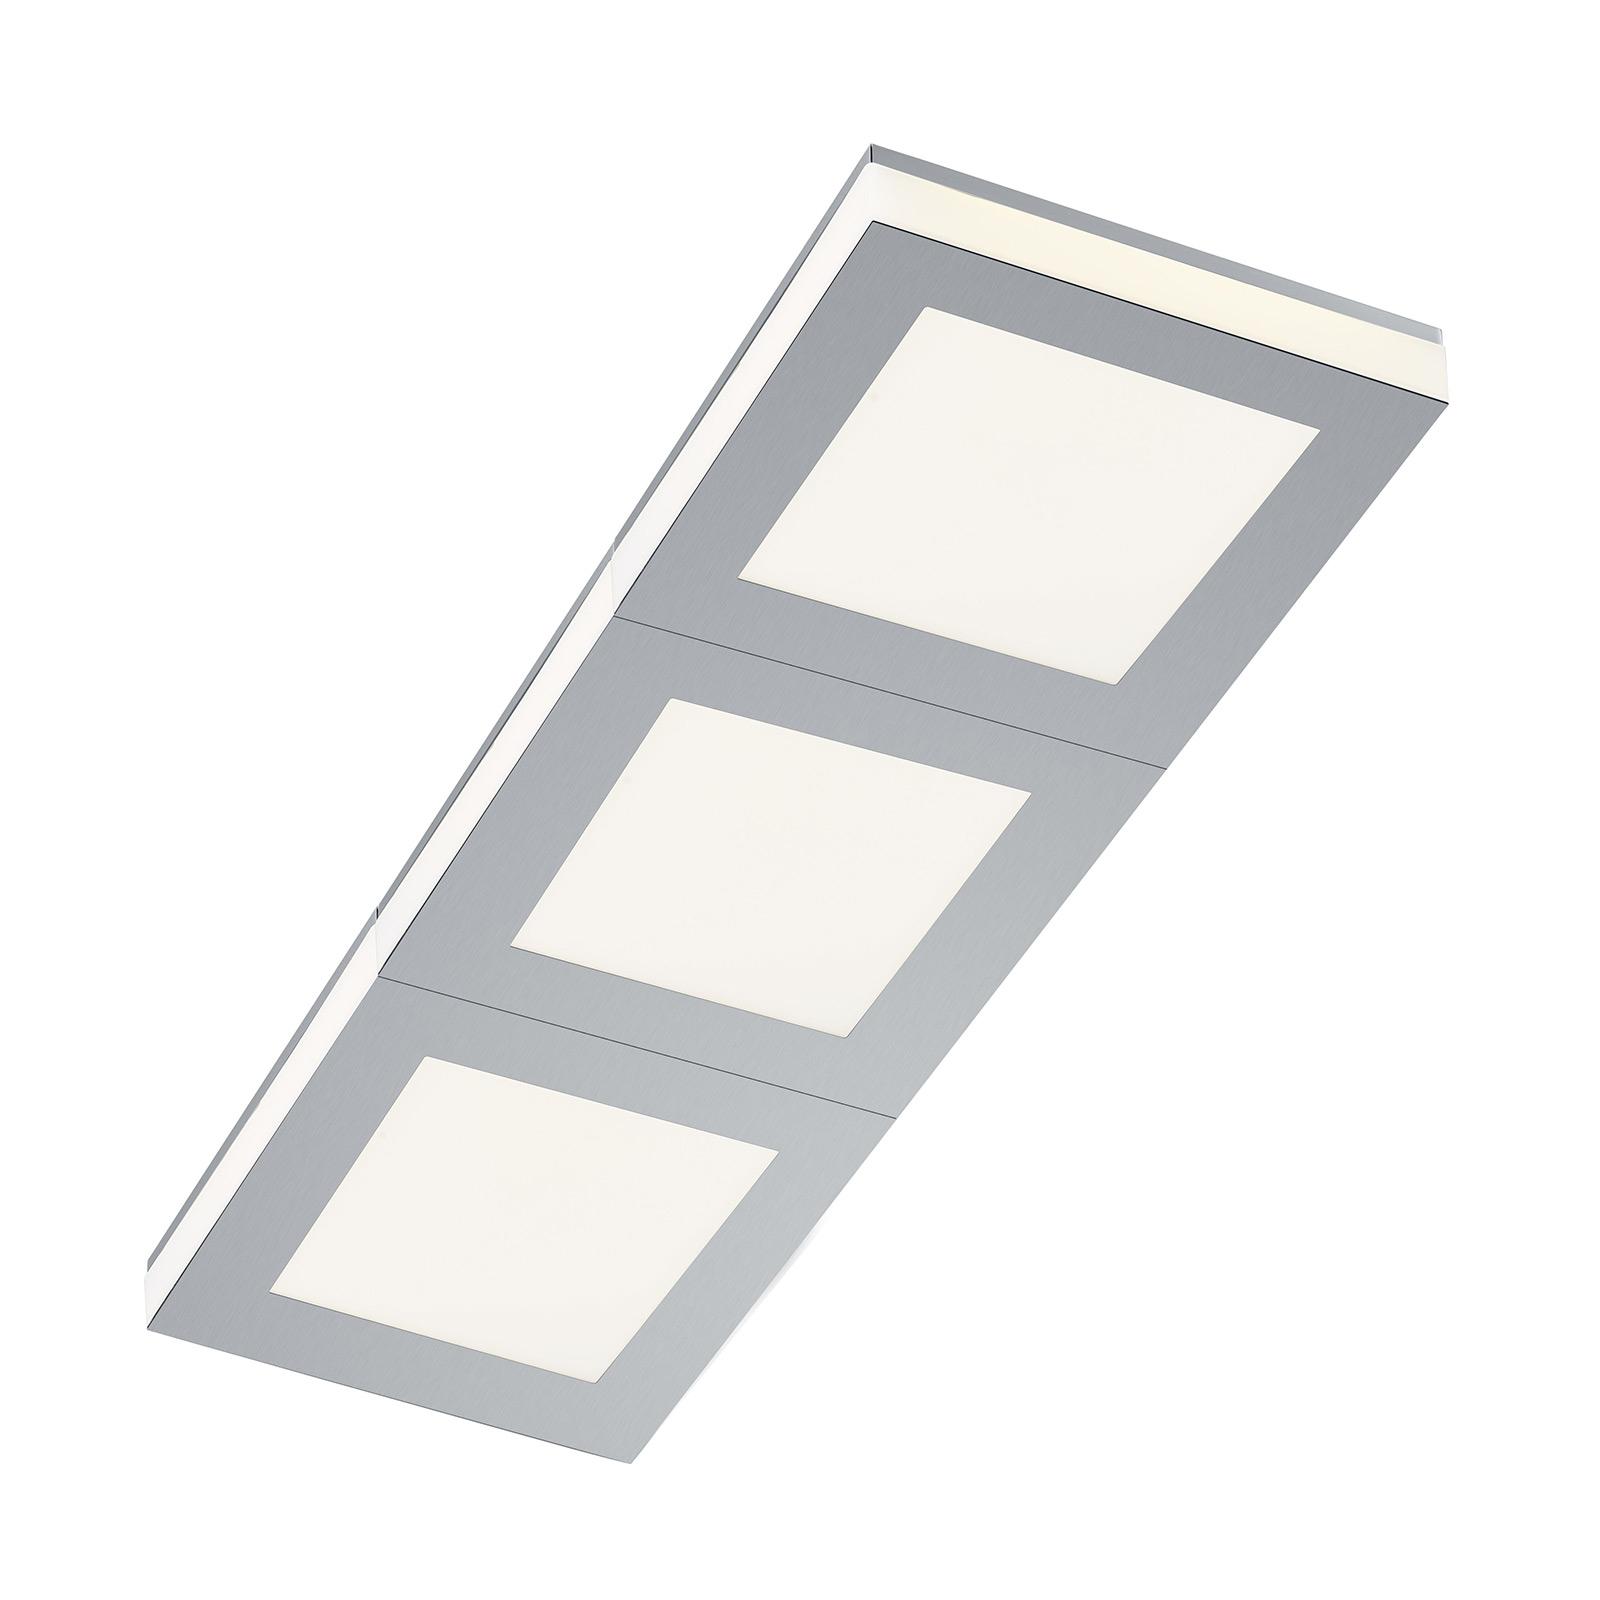 B-Leuchten Quadro LED plafondlamp 65x22 cm